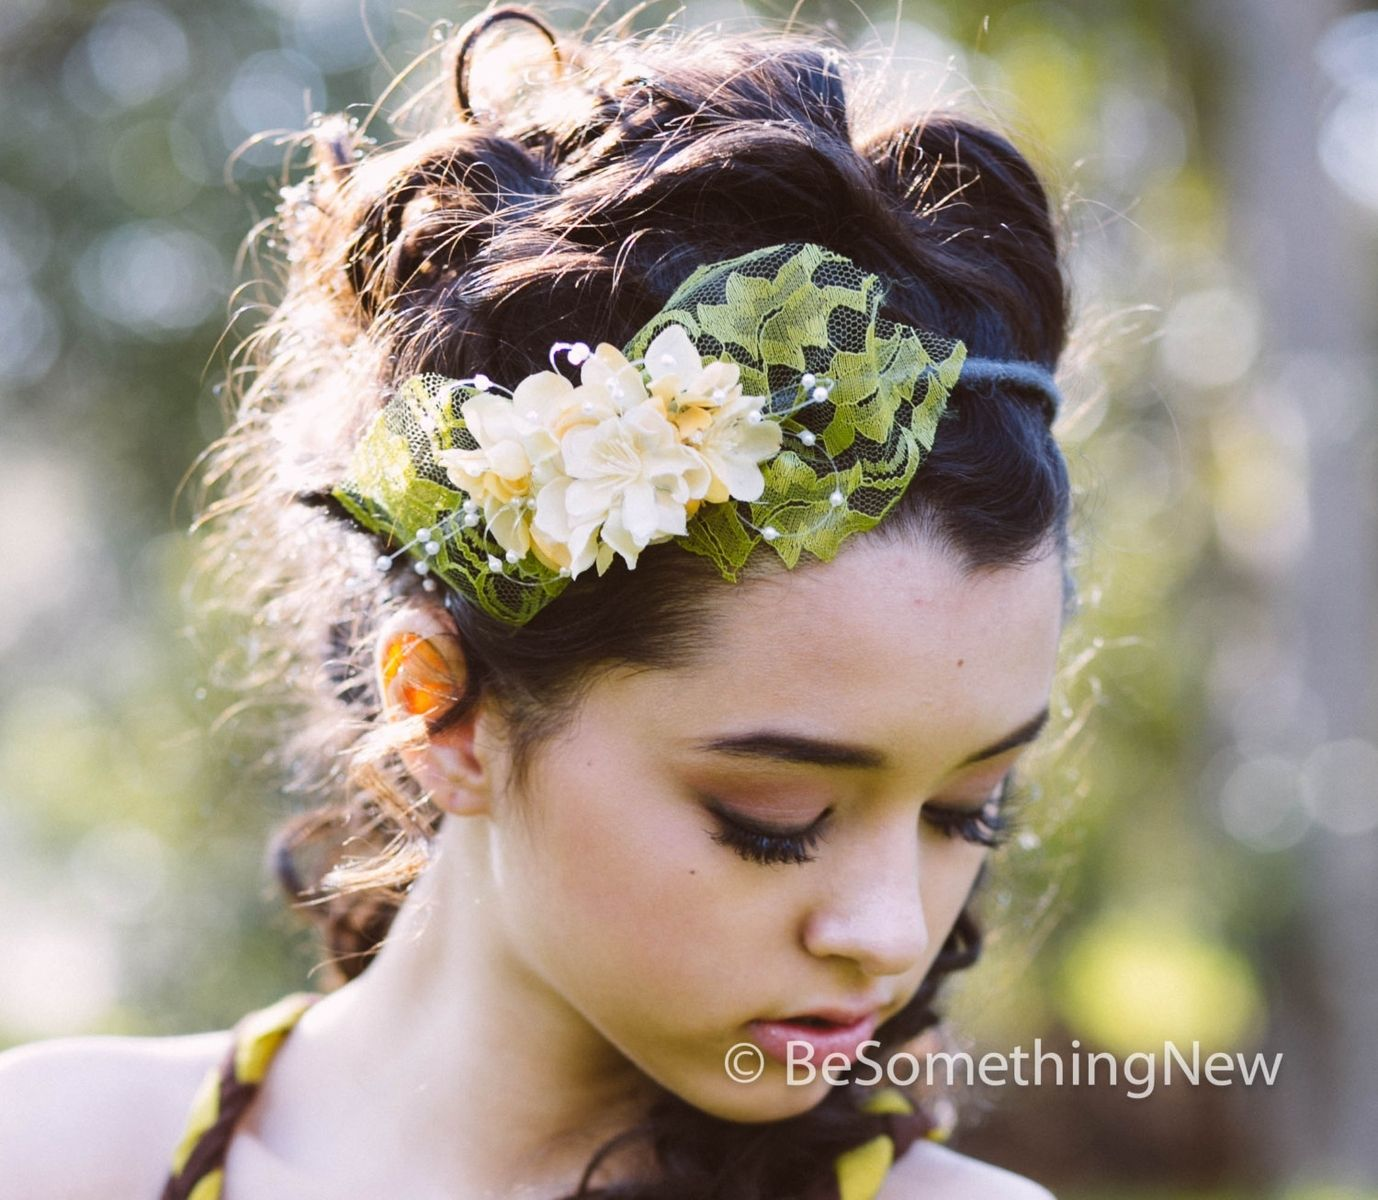 Custom Made Lace And Flowers Spring Headband f5f9e00d626